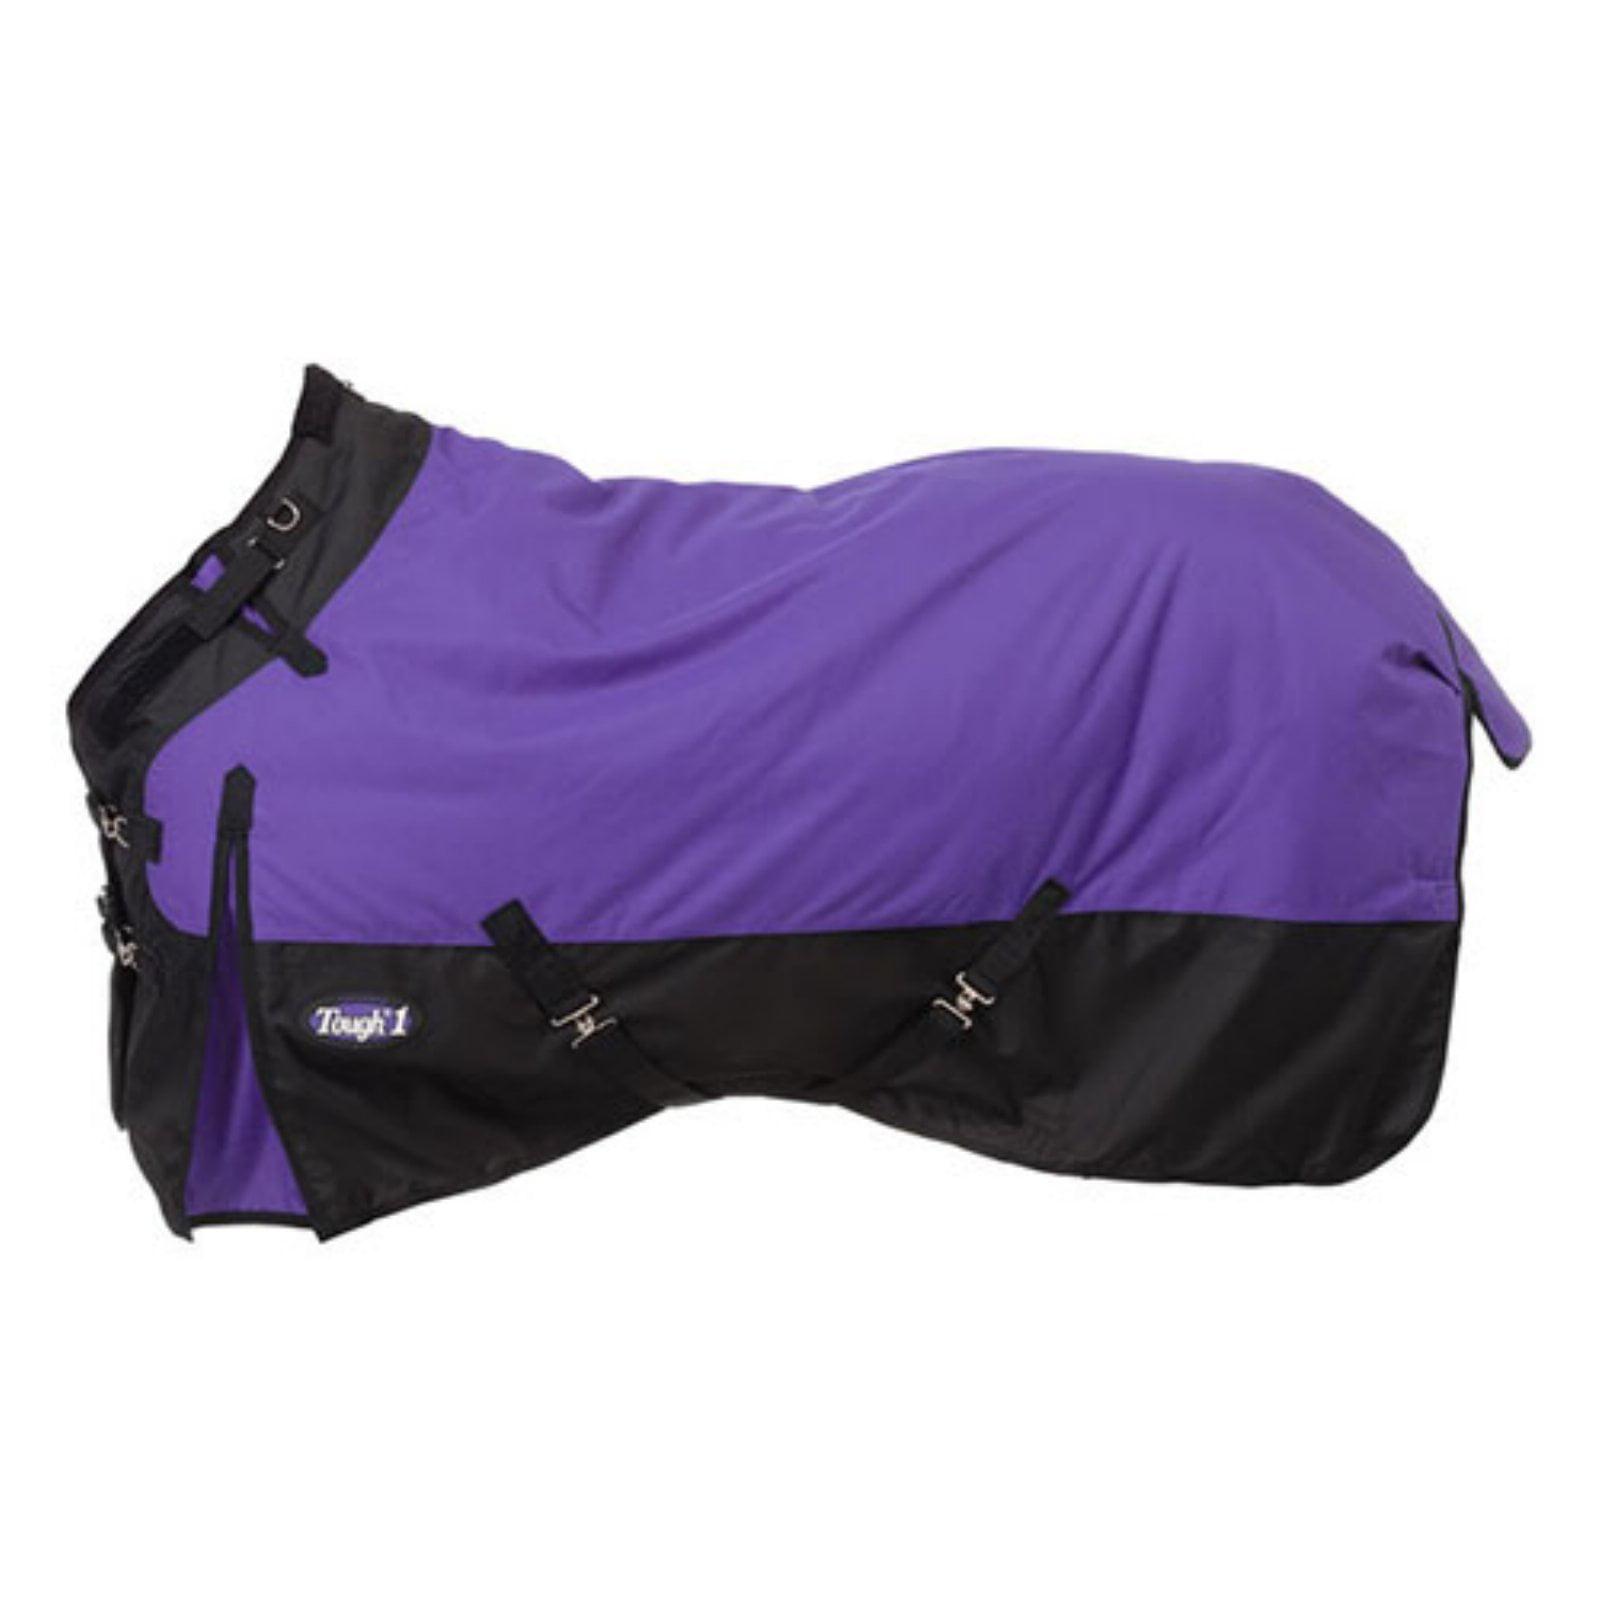 Tough-1 1200D Waterproof Poly Snuggit Turnout Blanket